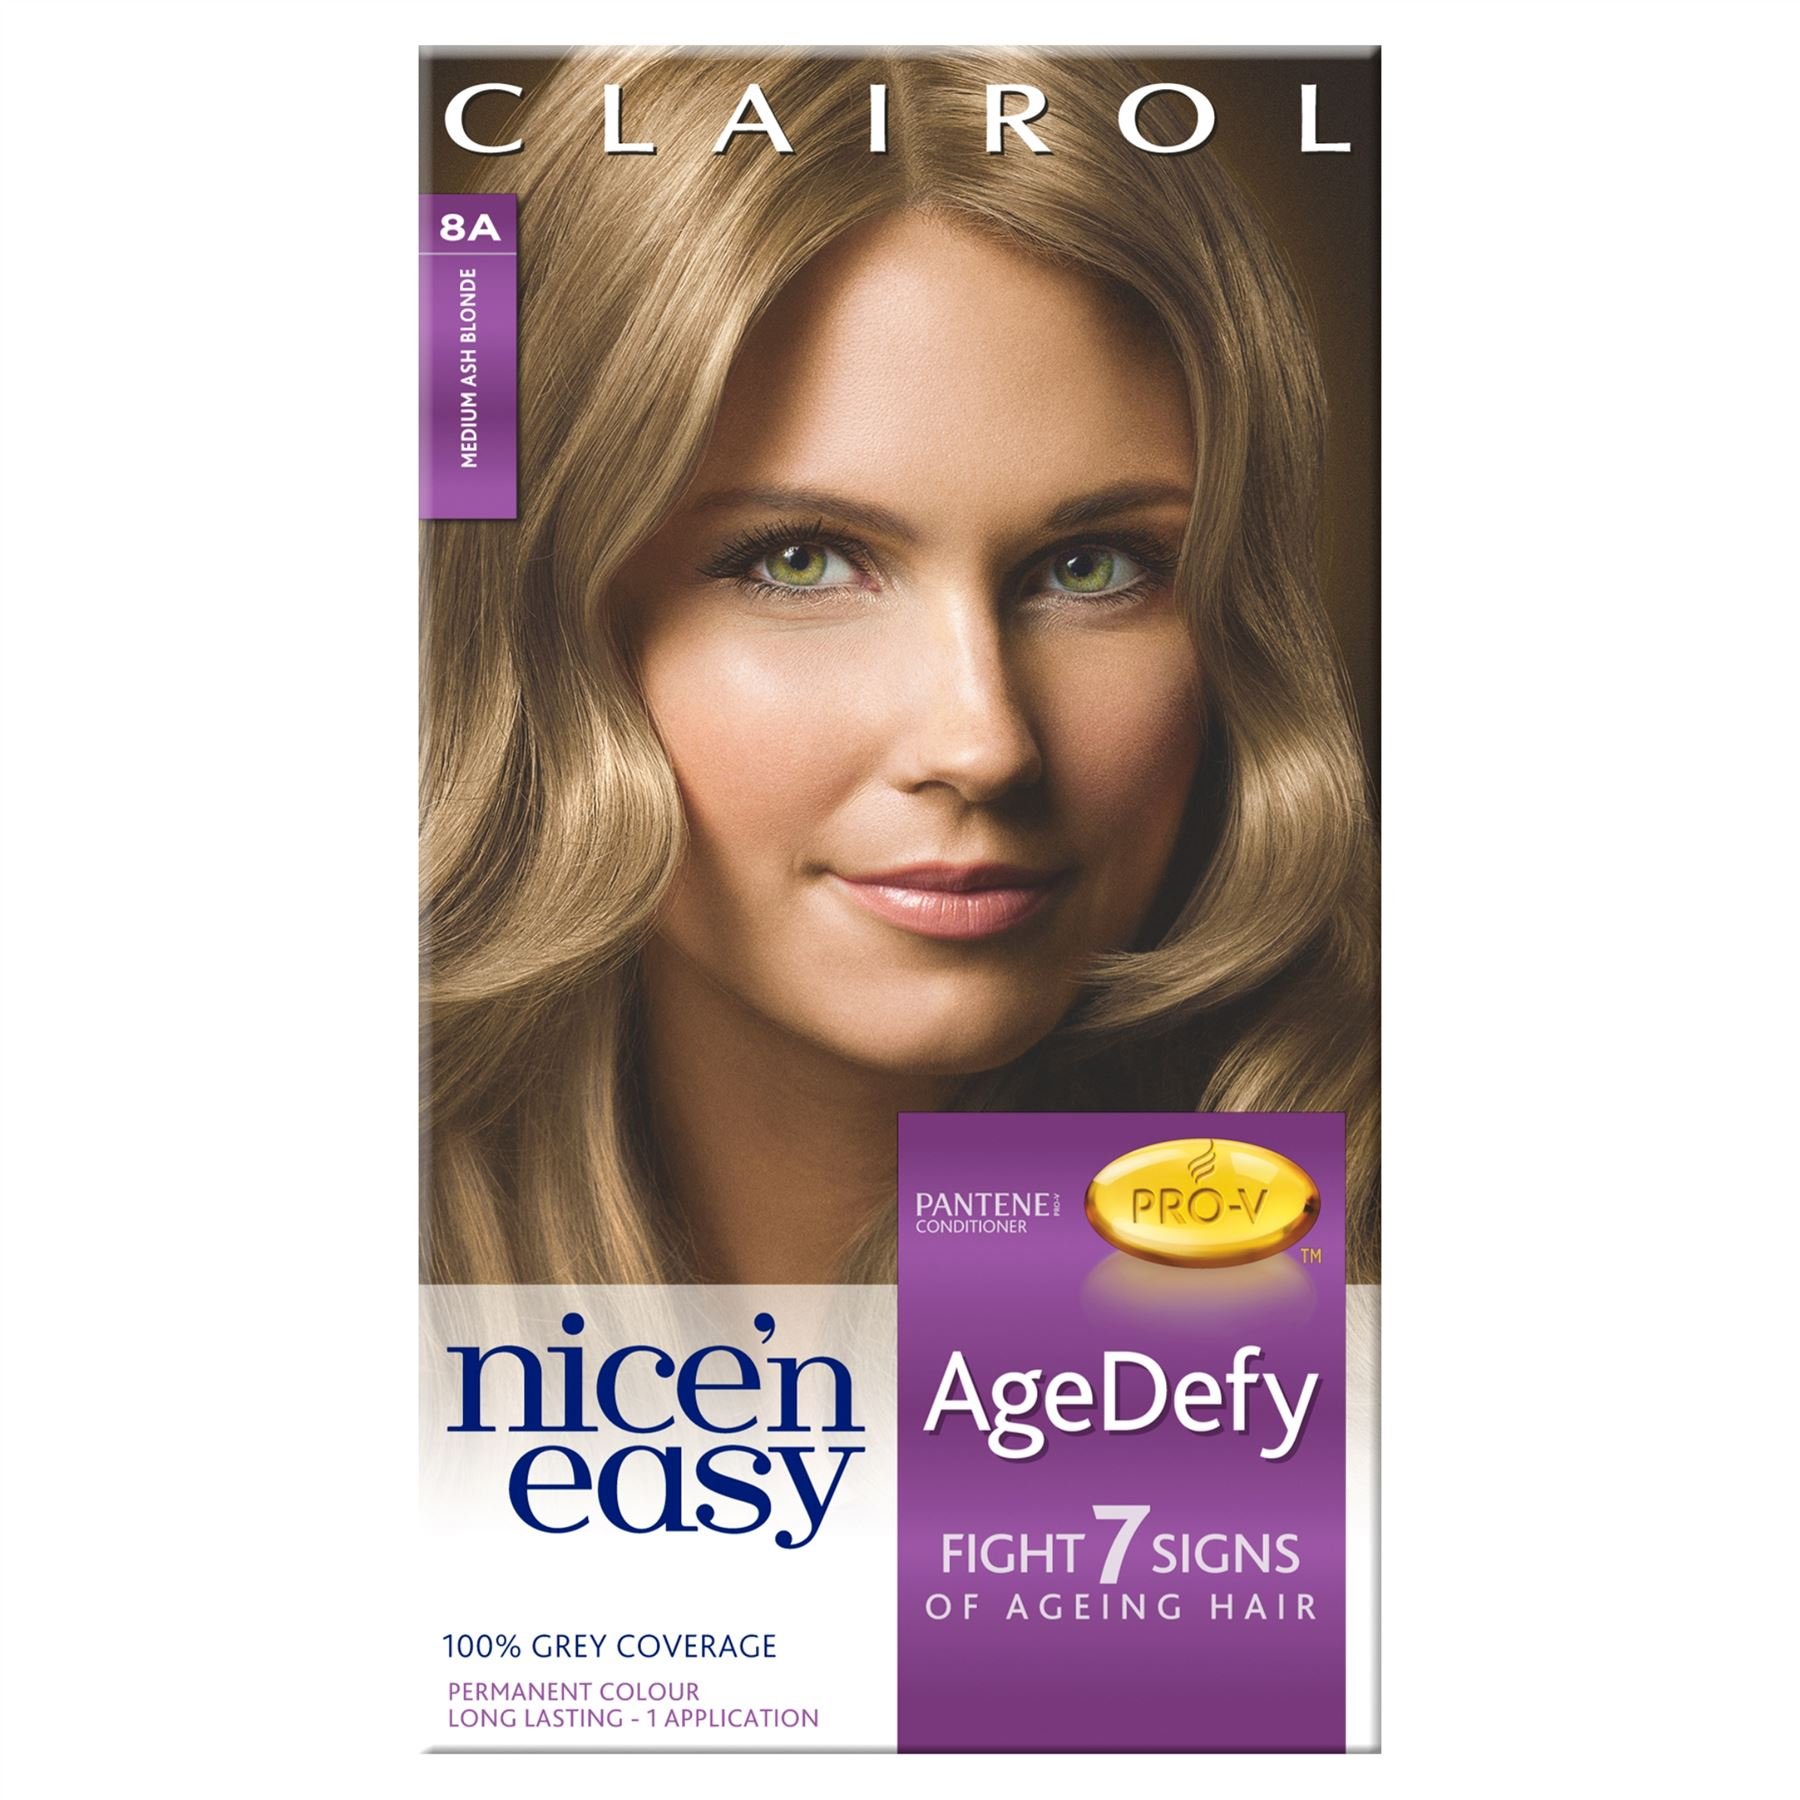 Clairol Nice N Easy Agedefy Permanent Colour 8a Medium Ash